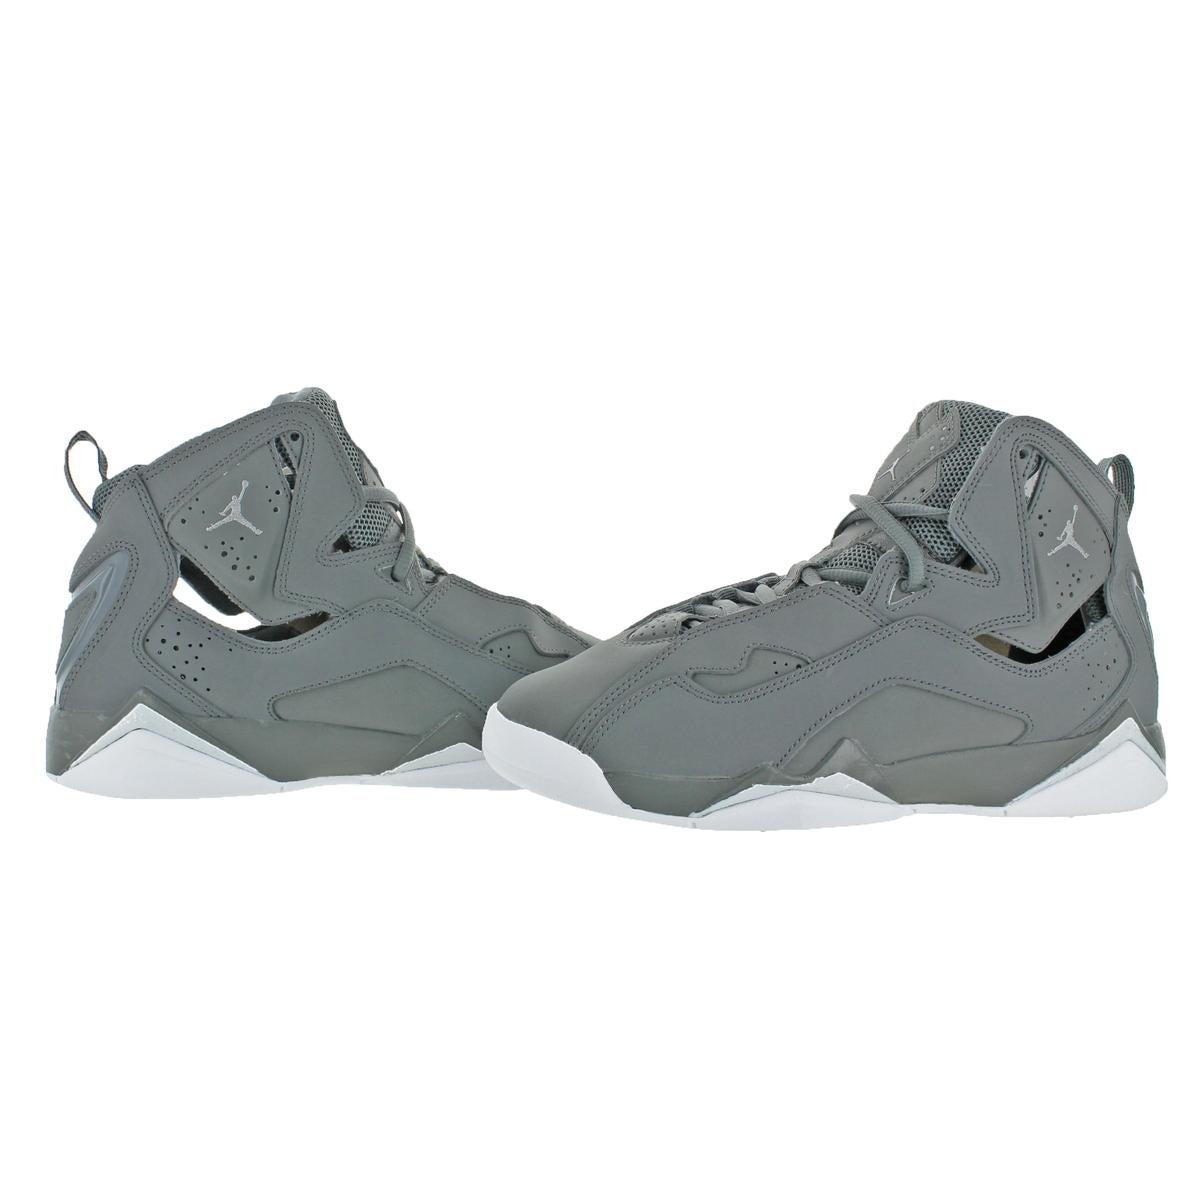 promo code e330c 2ed27 Shop Jordan Boys True Flight Basketball Shoes Big Kid Fashion - Free  Shipping Today - Overstock - 22119669